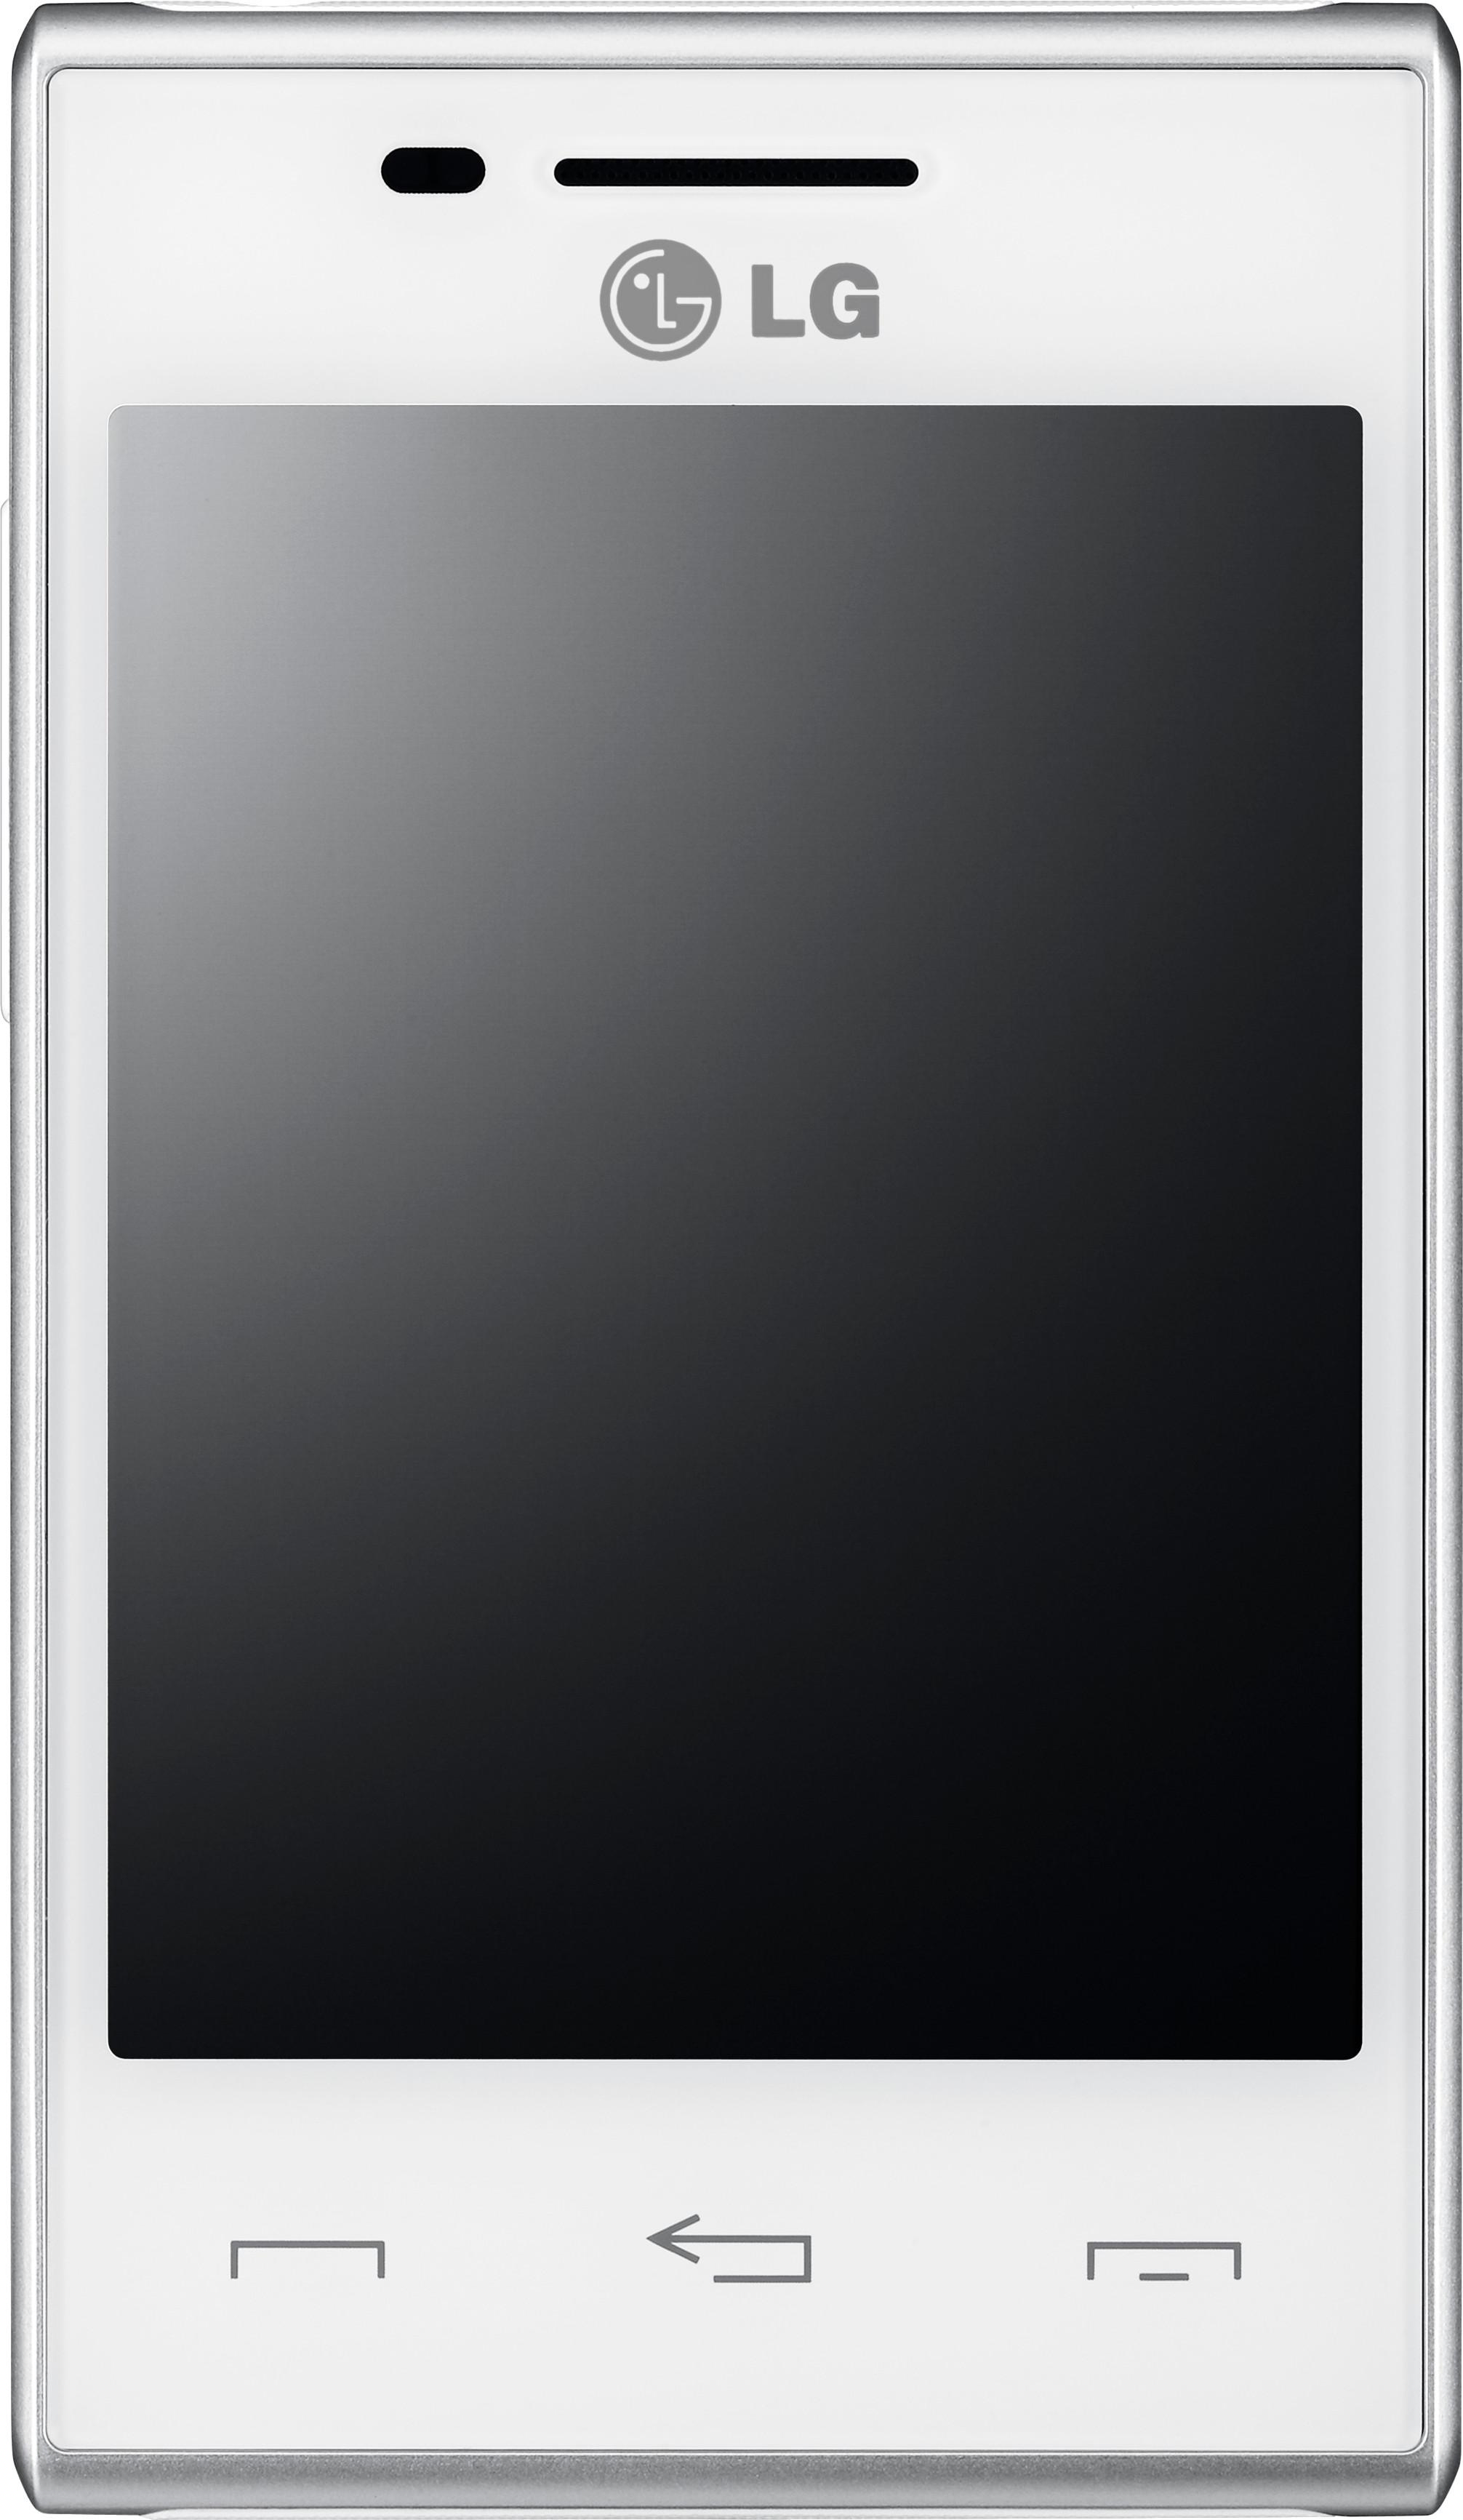 LG T585 (50MB)